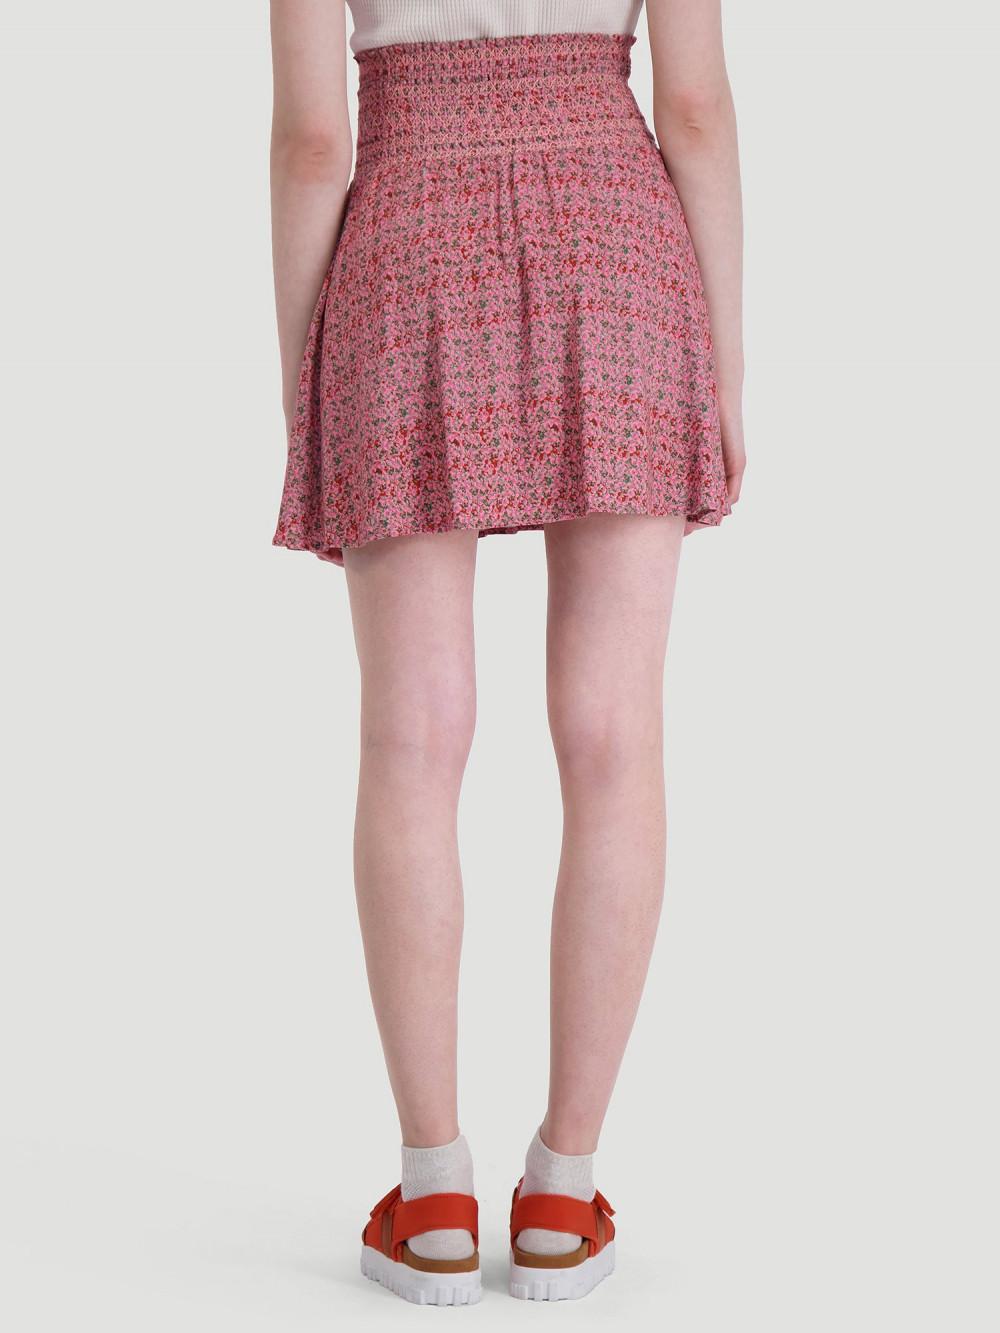 Disen Skirt Pink Print Small